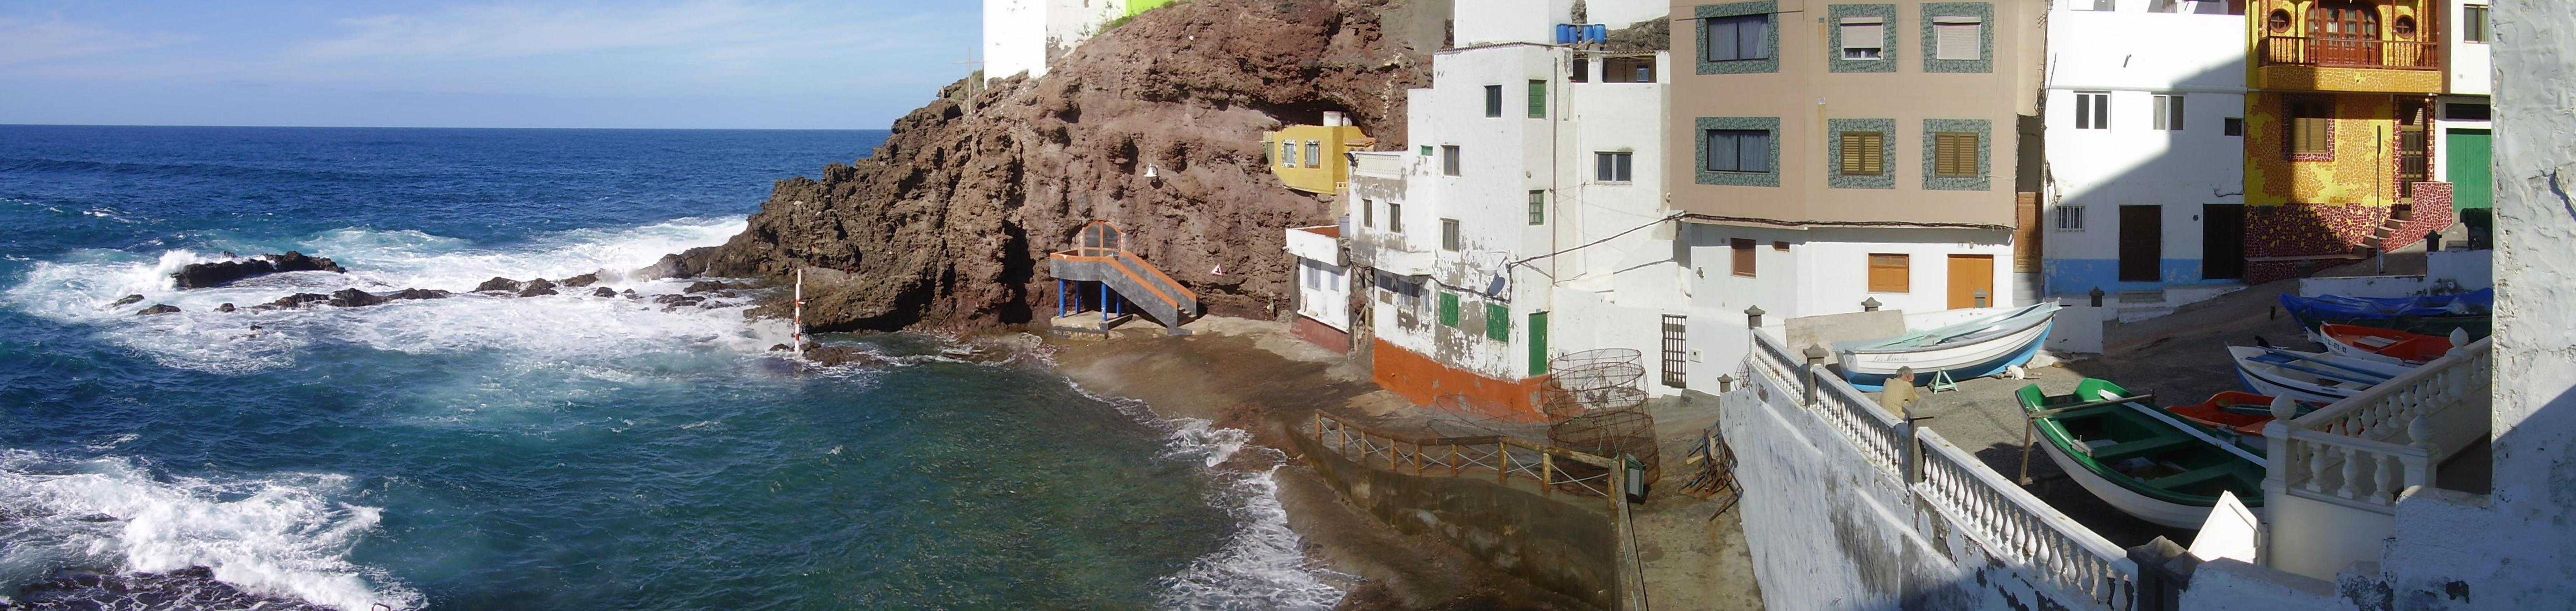 Playa Caleta de Arriba